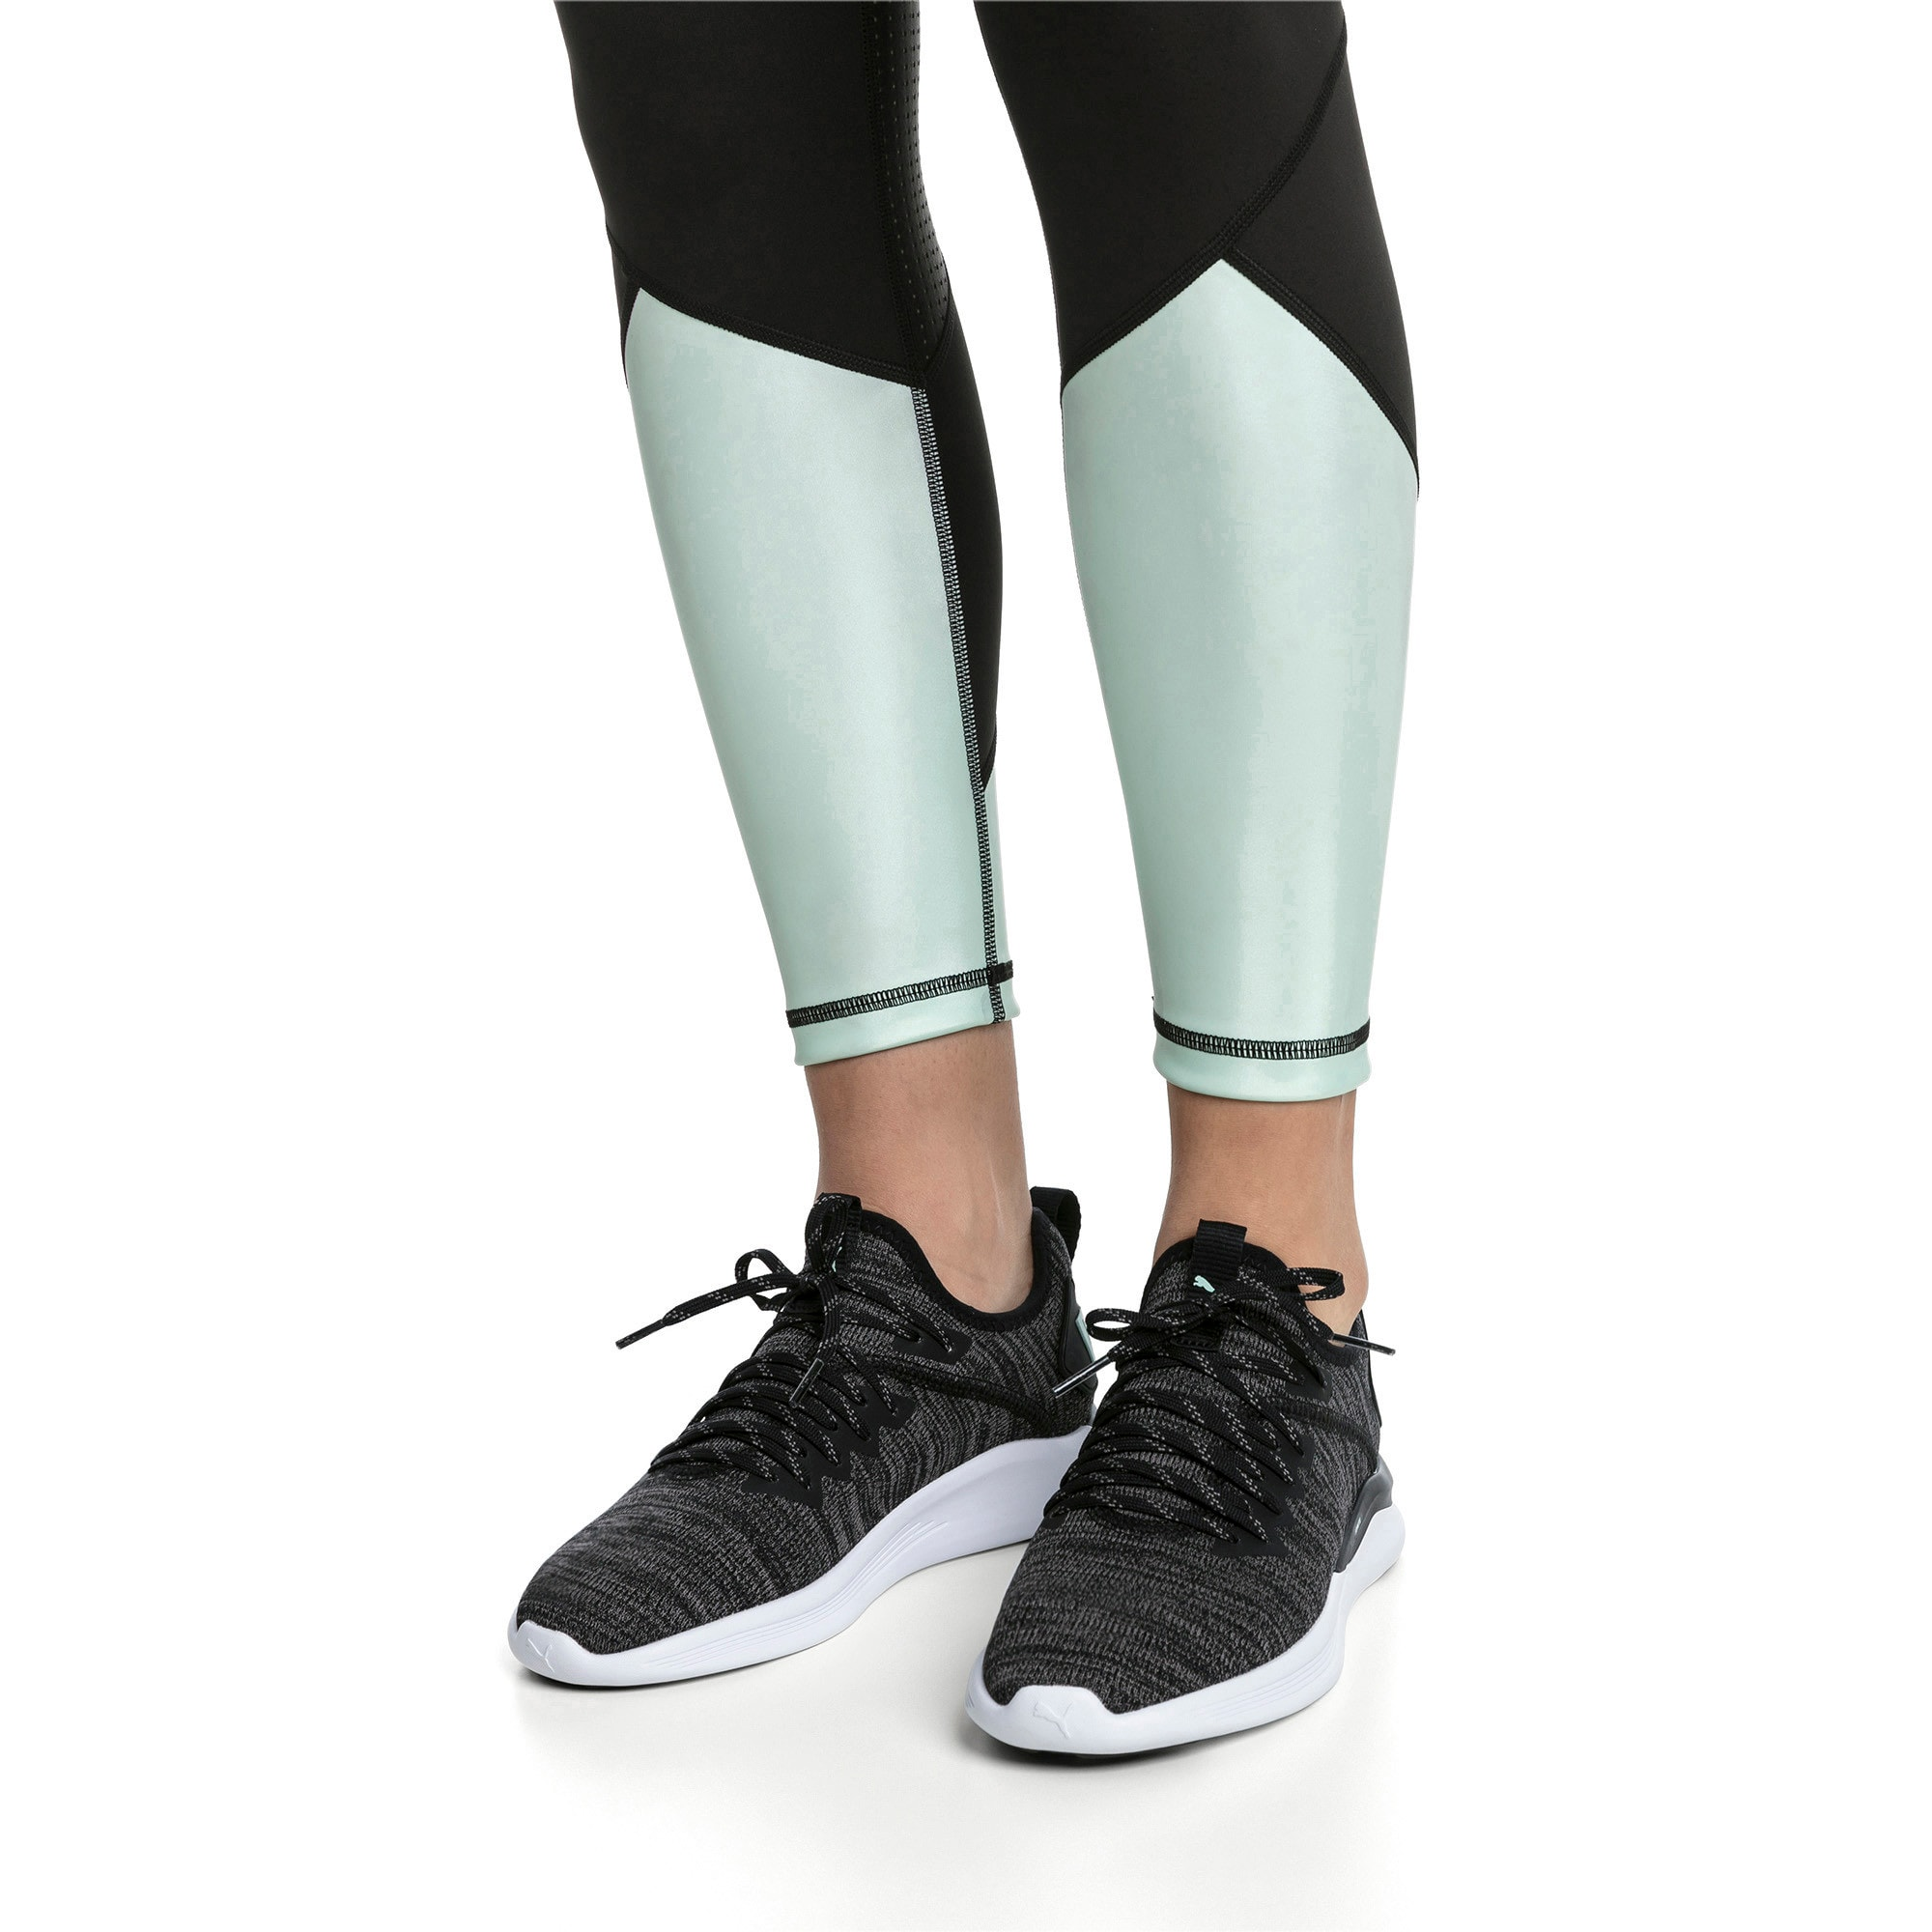 Thumbnail 2 of IGNITE Flash evoKNIT Women's Running Shoes, Black-Charcoal-Fair Aqua, medium